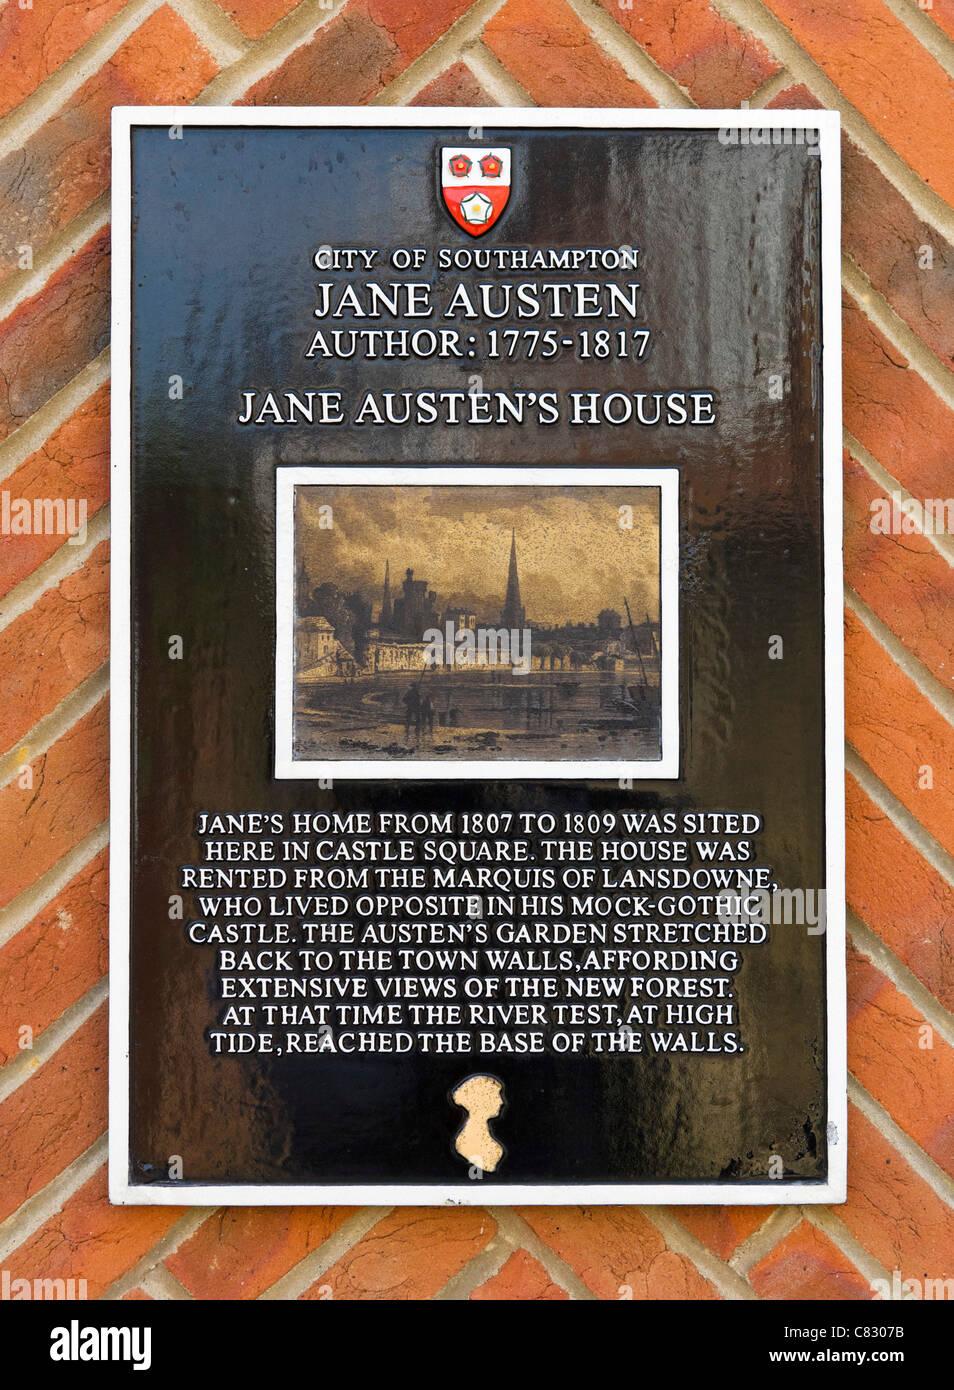 Plaque at Bosun's Locker Pub commemorating site of the house of  novelist Jane Austen, Castle Square, Southampton, - Stock Image